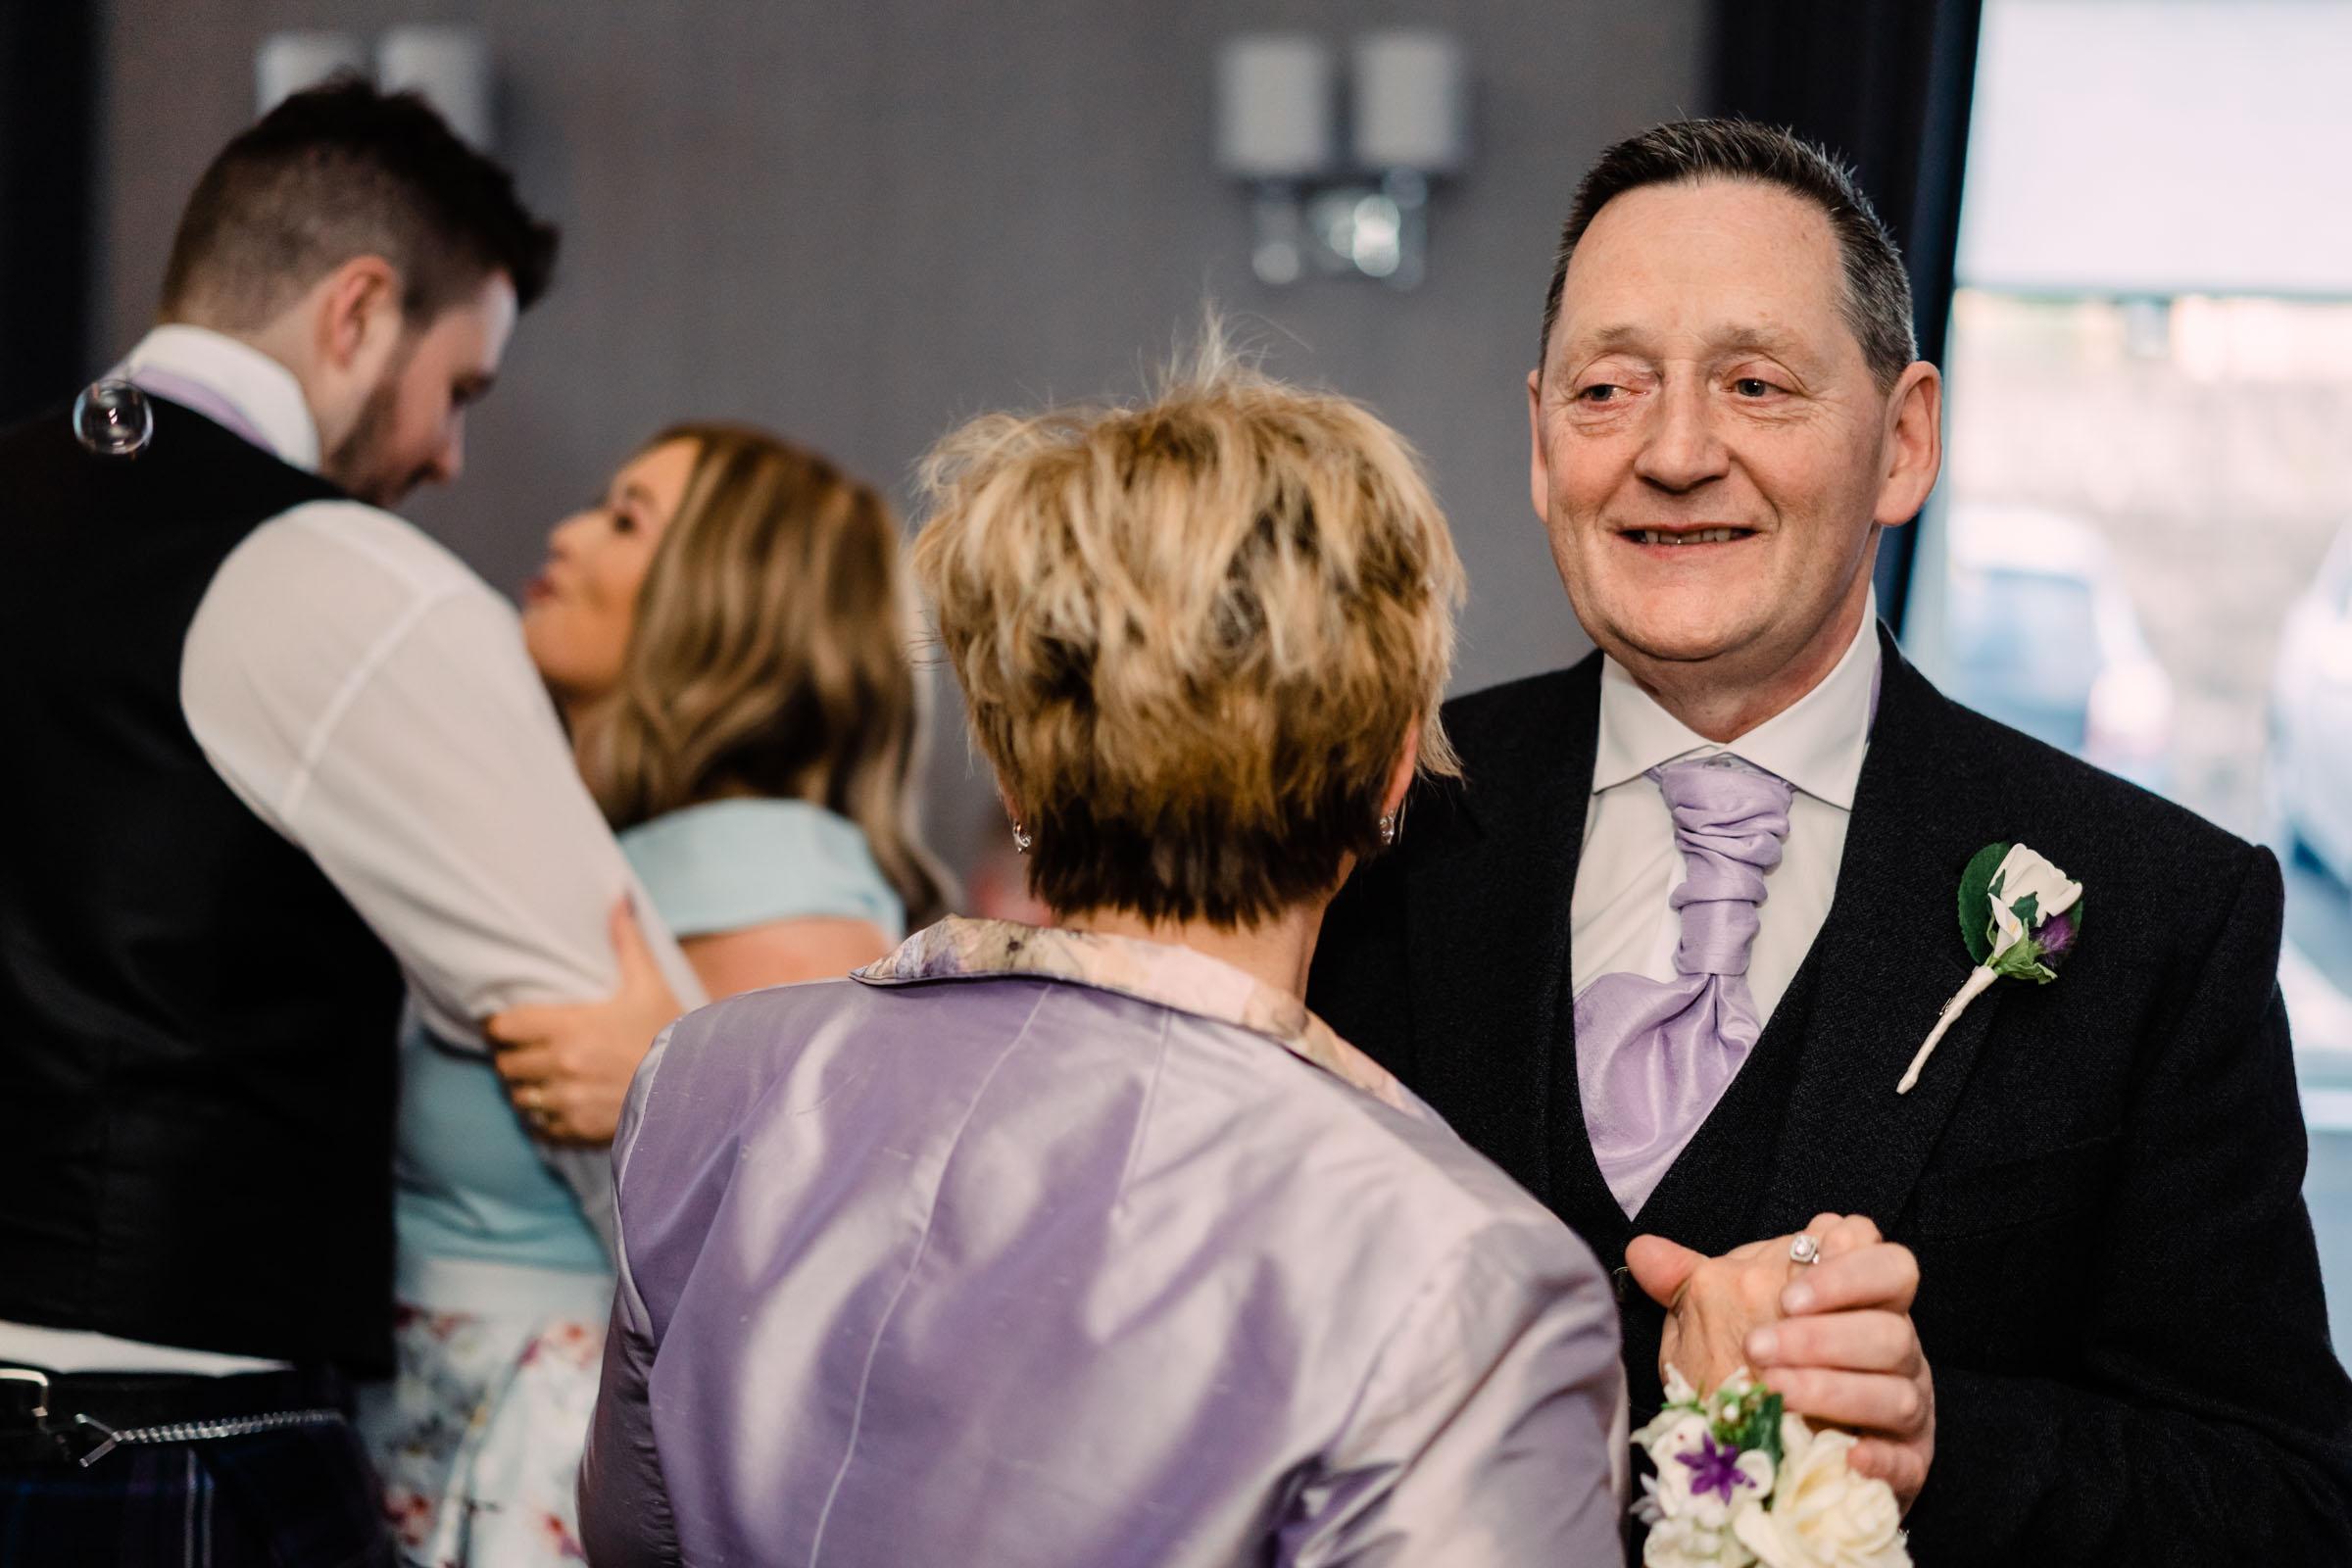 motherwell-moorings-wedding-photographer-dearlyphotography (74 of 77).jpg